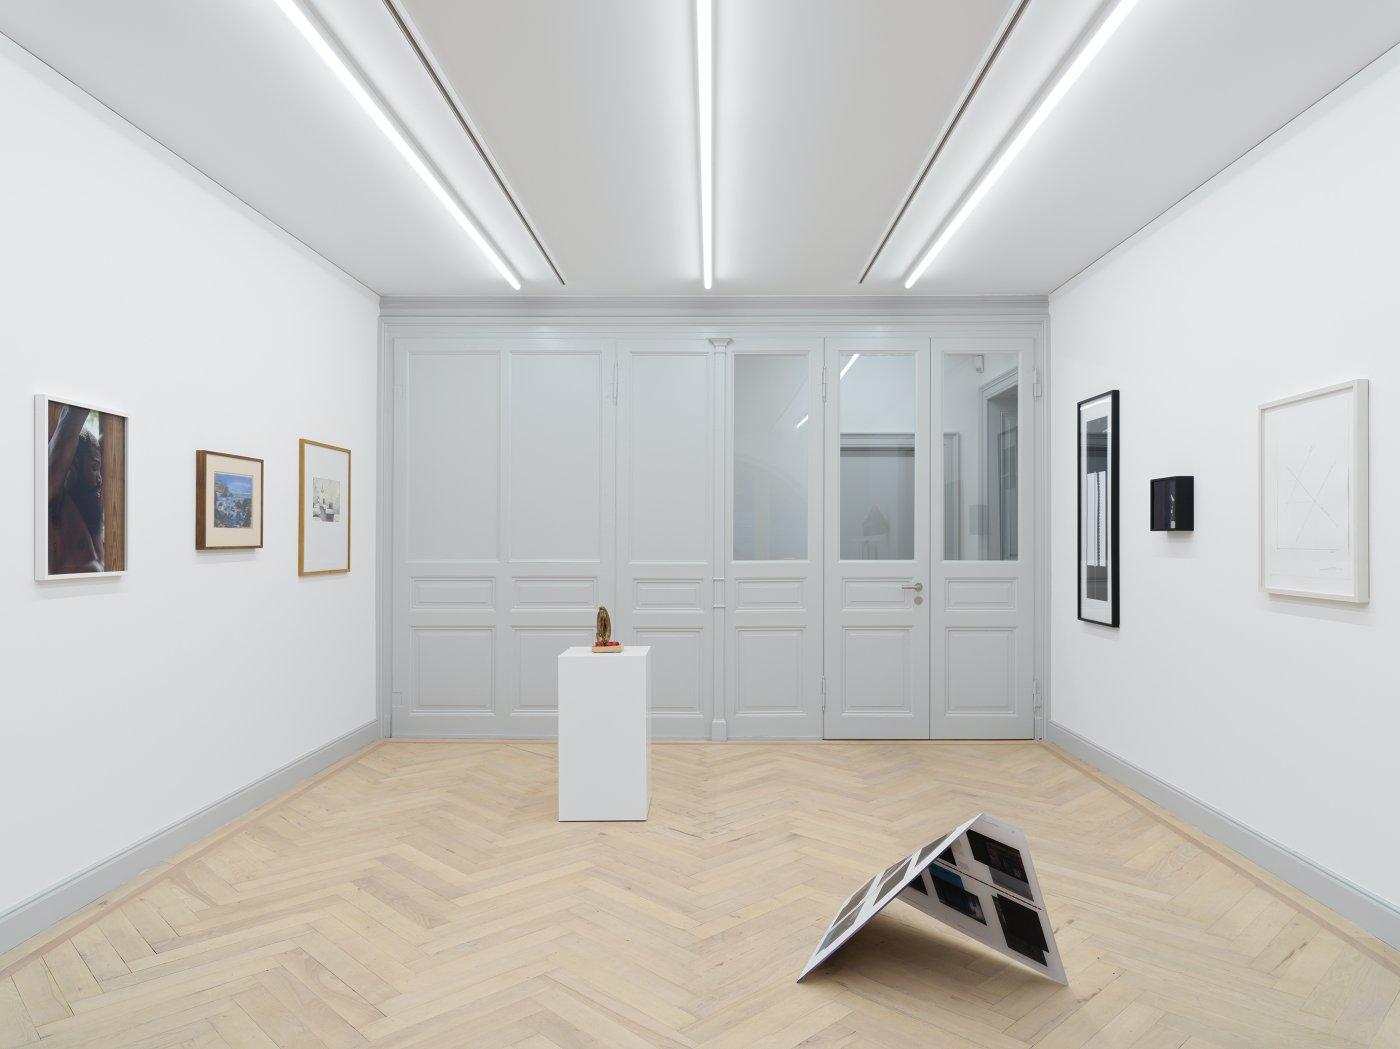 Galerie Eva Presenhuber All in One 11